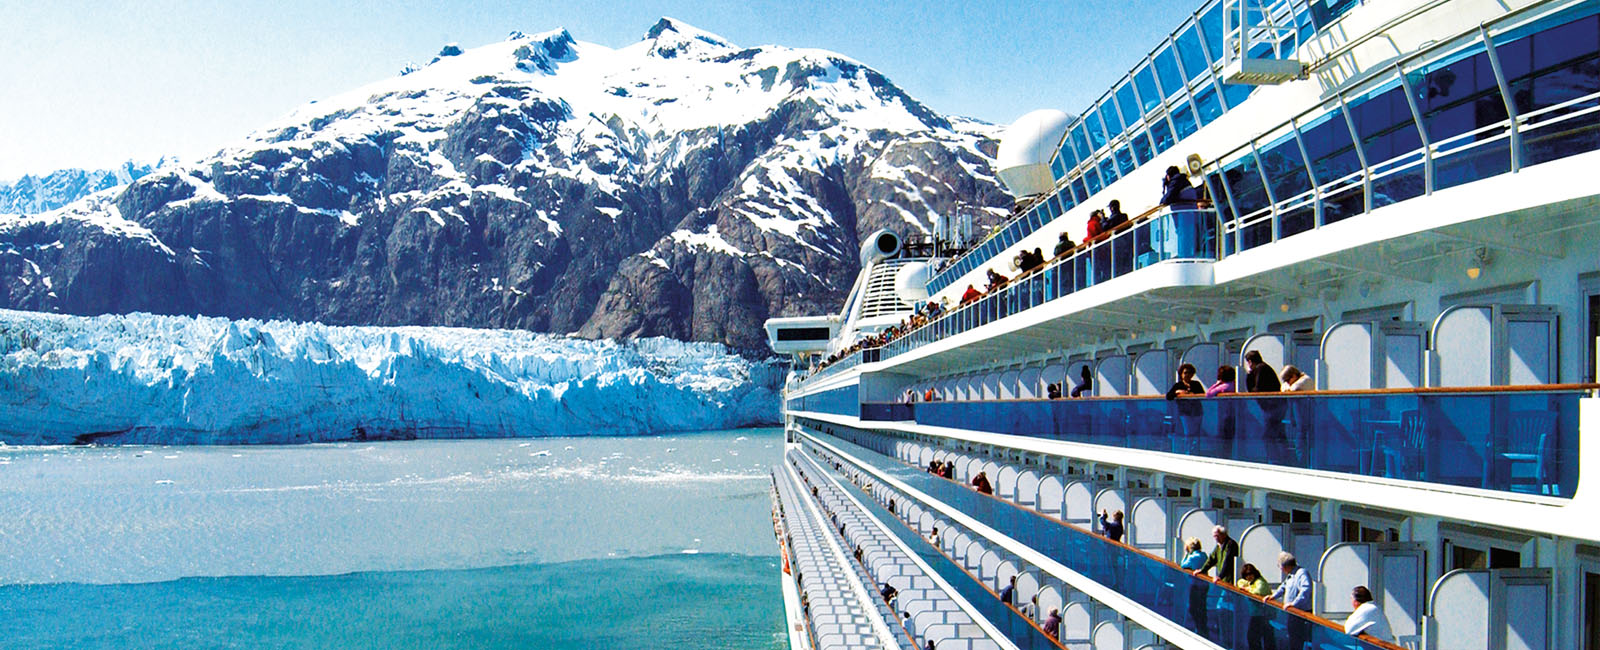 Ship in Alaska.jpg